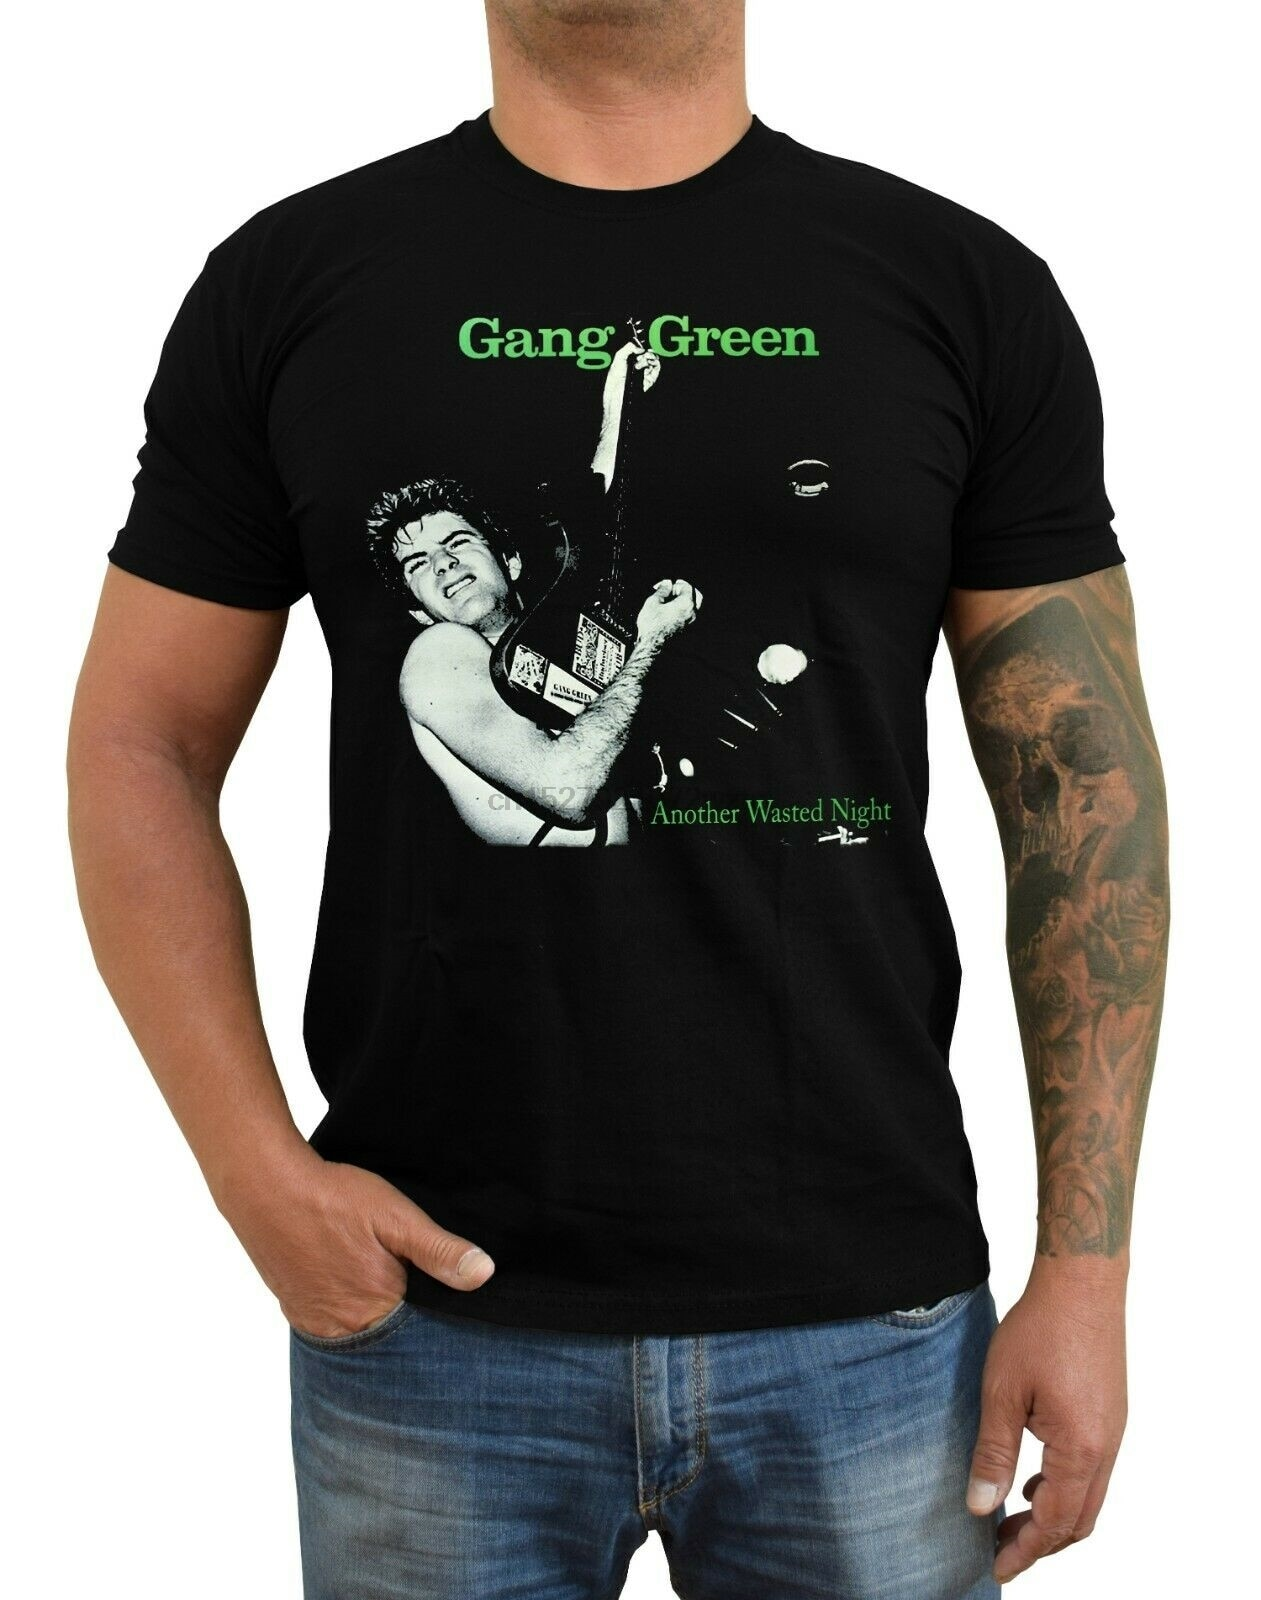 Banda Verde otra noche desperdiciada, camiseta de la banda Punk Hardcore (negro) S-5XL